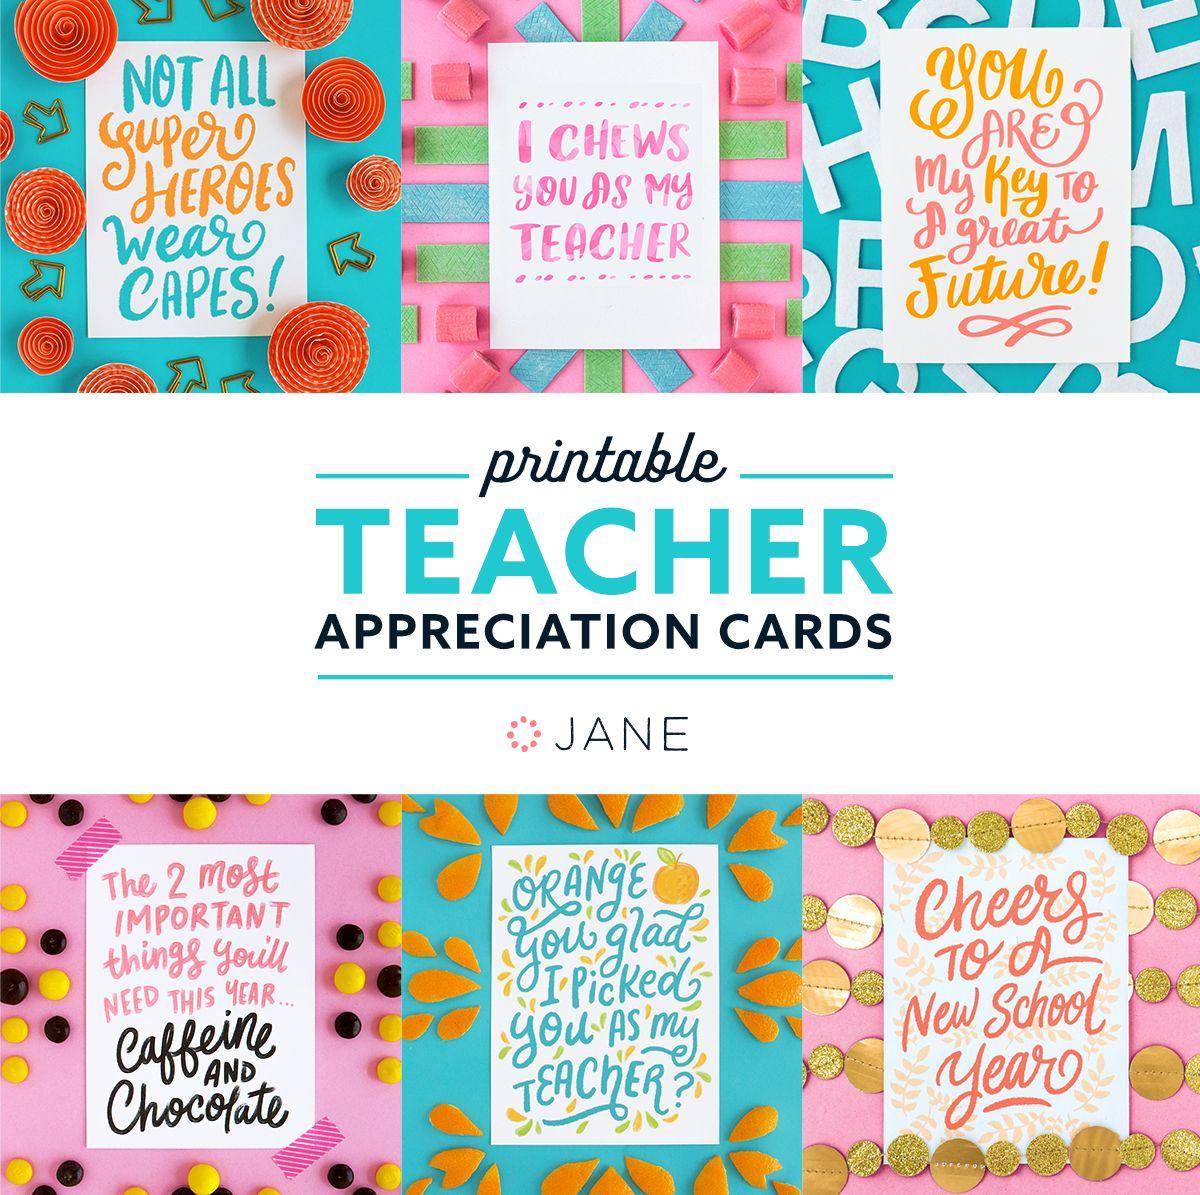 Jane Com Free Teacher Appreciation Printable Cards Appreciation Printable Teacher Appreciation Cards Teachers Day Card